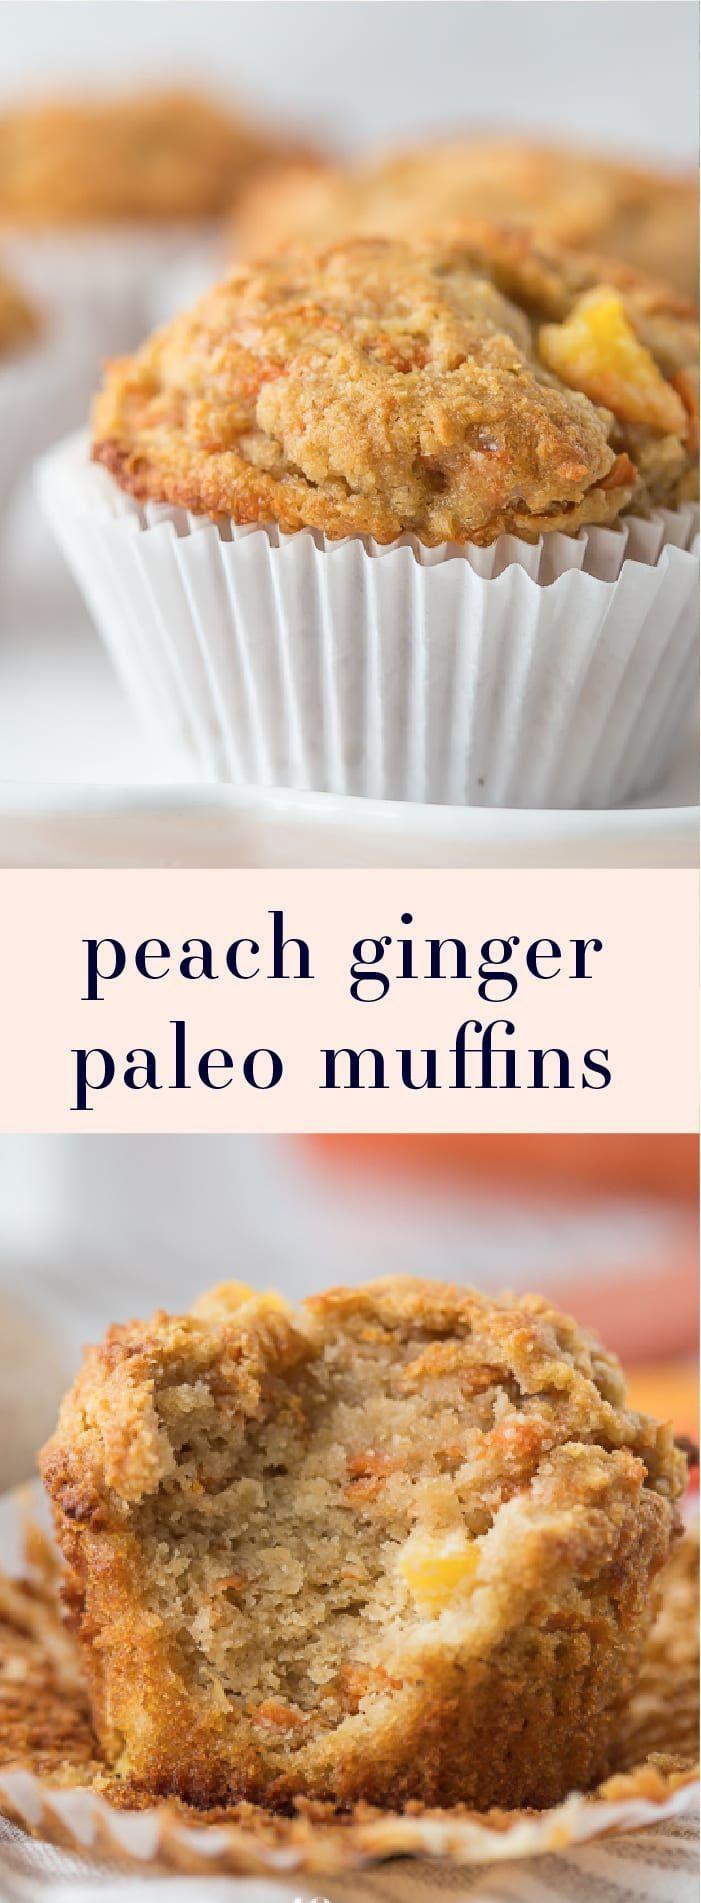 peach ginger paleo muffins are moist and tender, full of fruity, fresh ...